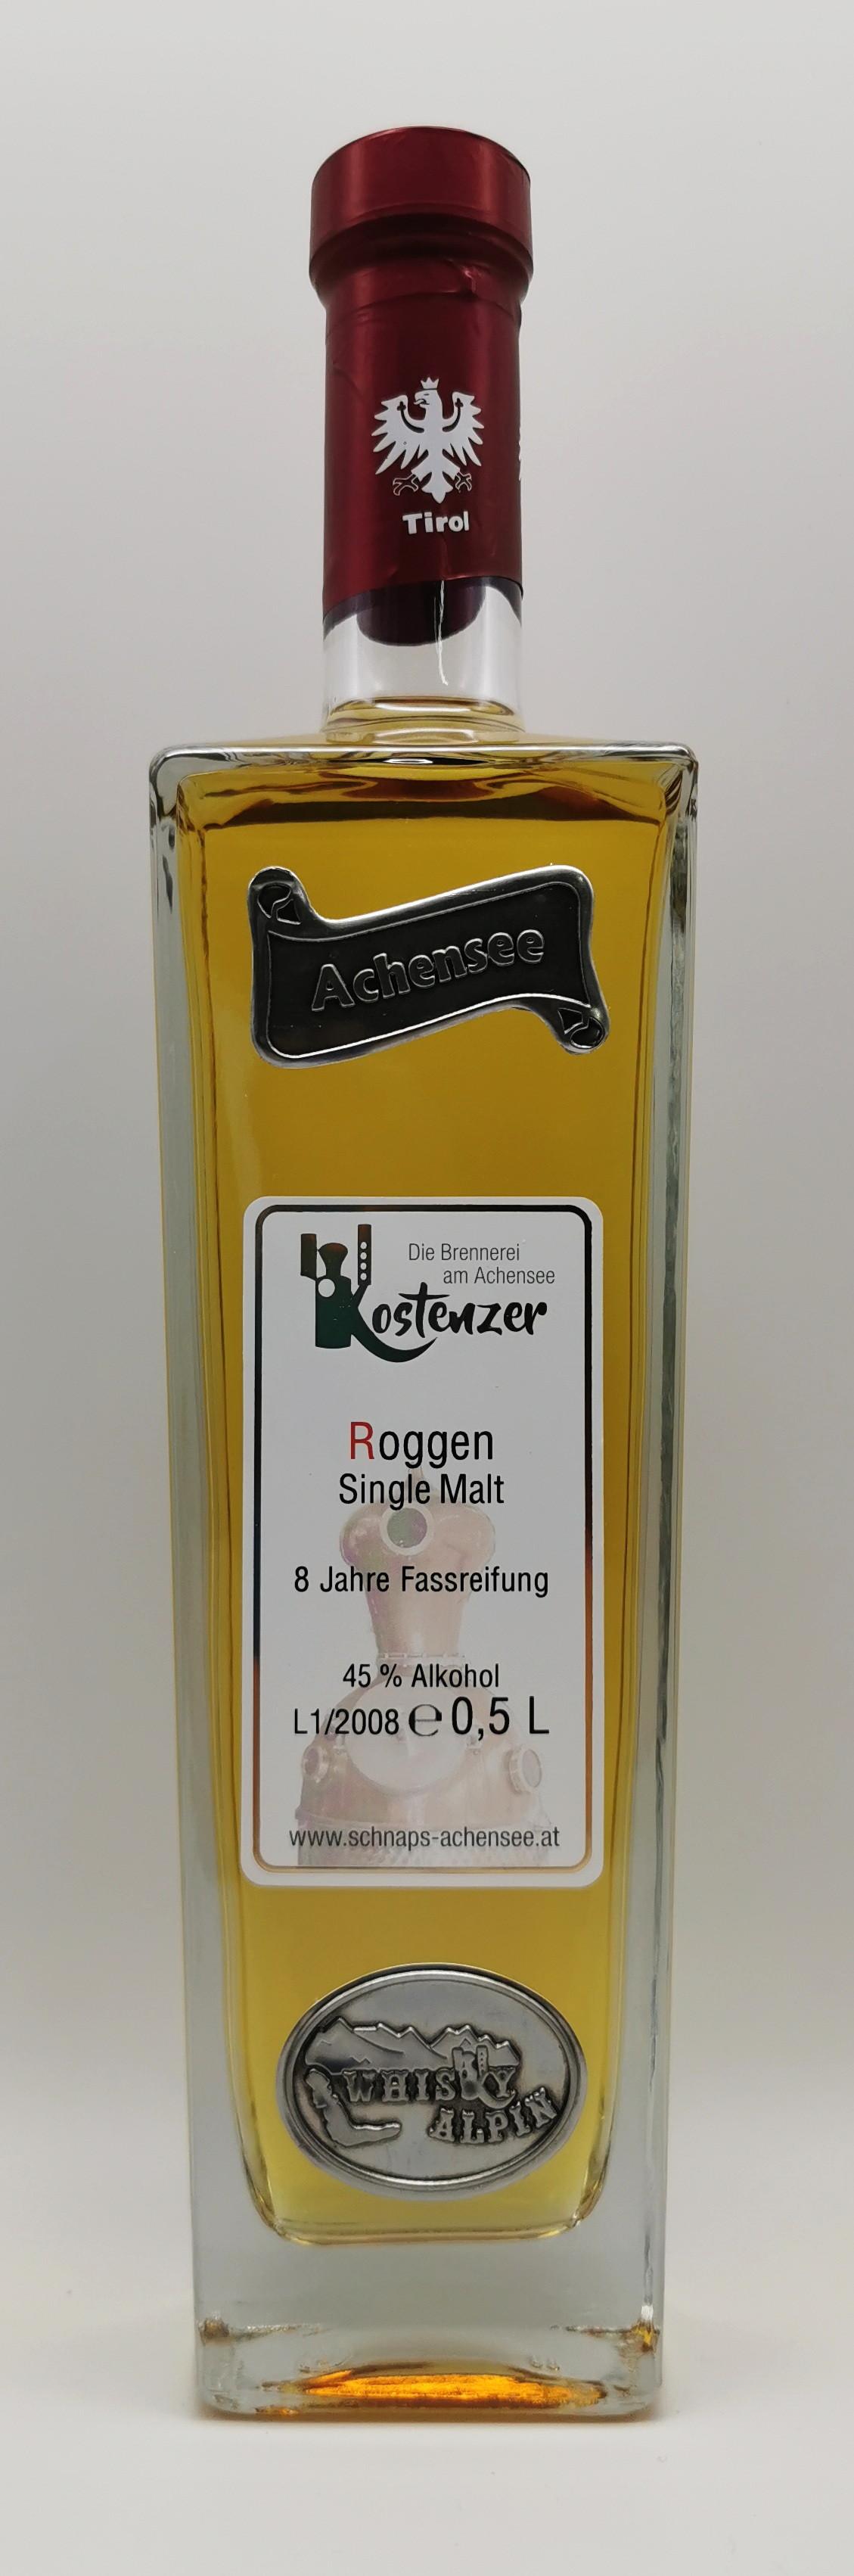 Single Malt Roggen